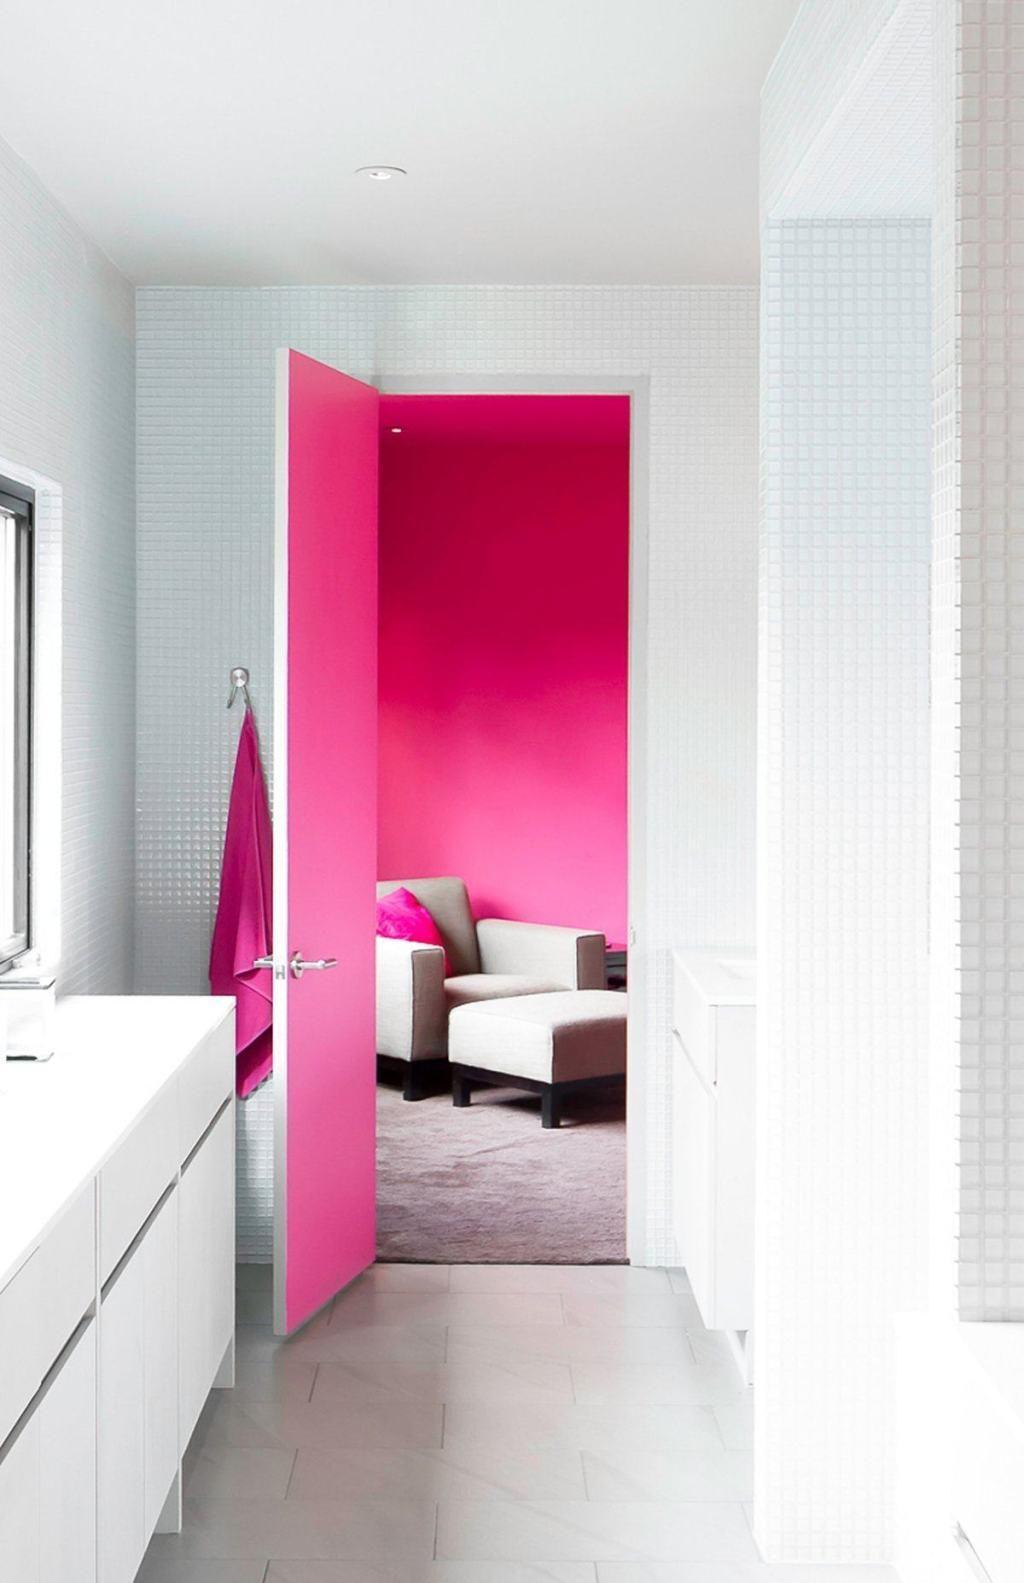 Rosa Badezimmer 60+ Designs & Dekoration Fotos   Haus ...